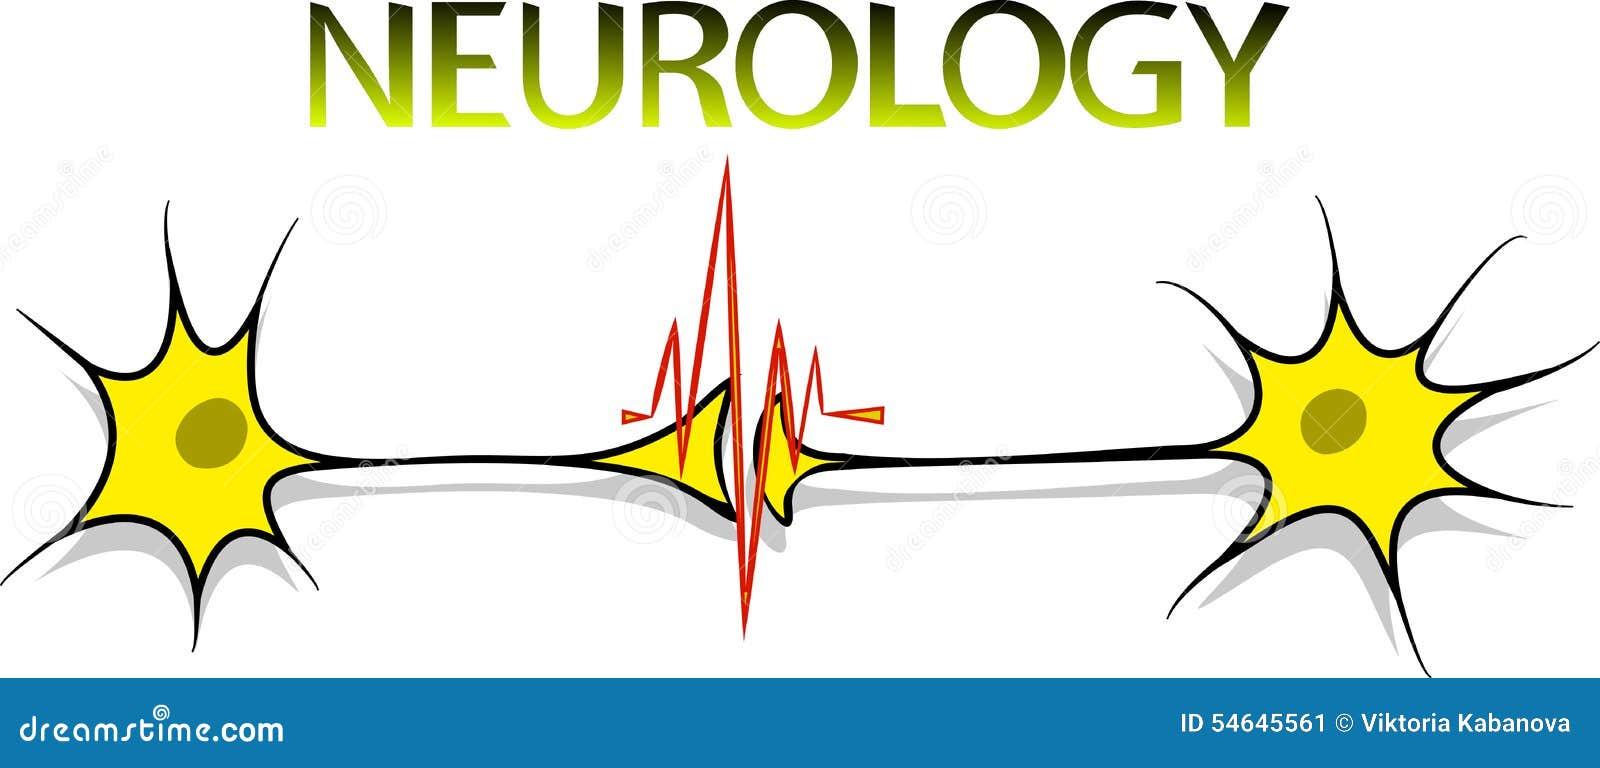 neurology logo stock vector image 54645561